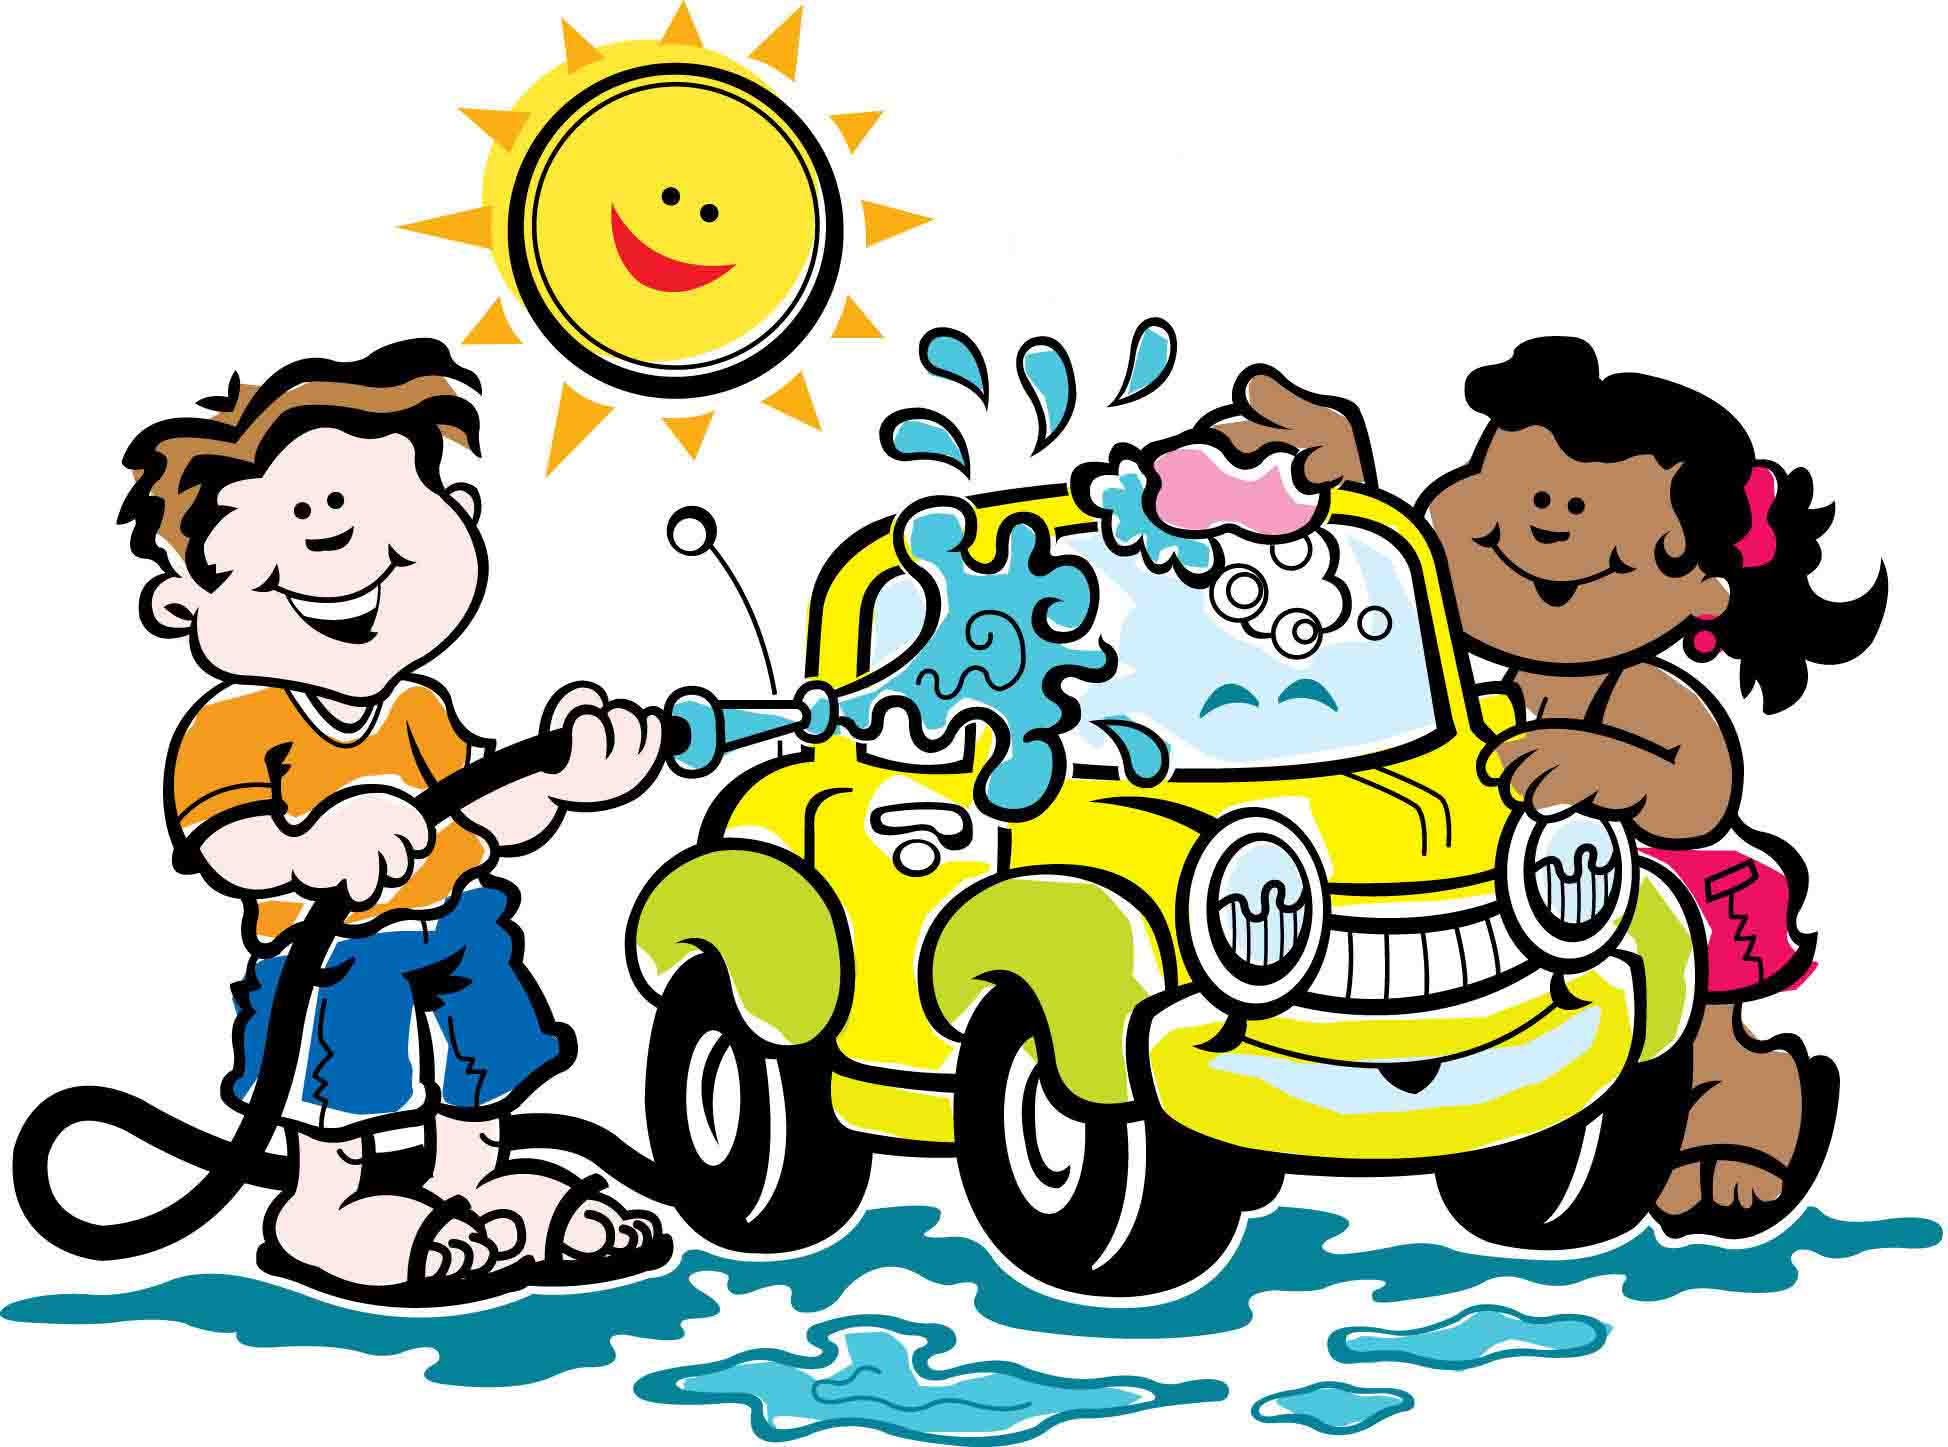 http://blog.pinturaparacoche.com/wp-content/uploads/2011/08/lavar-coche.jpg